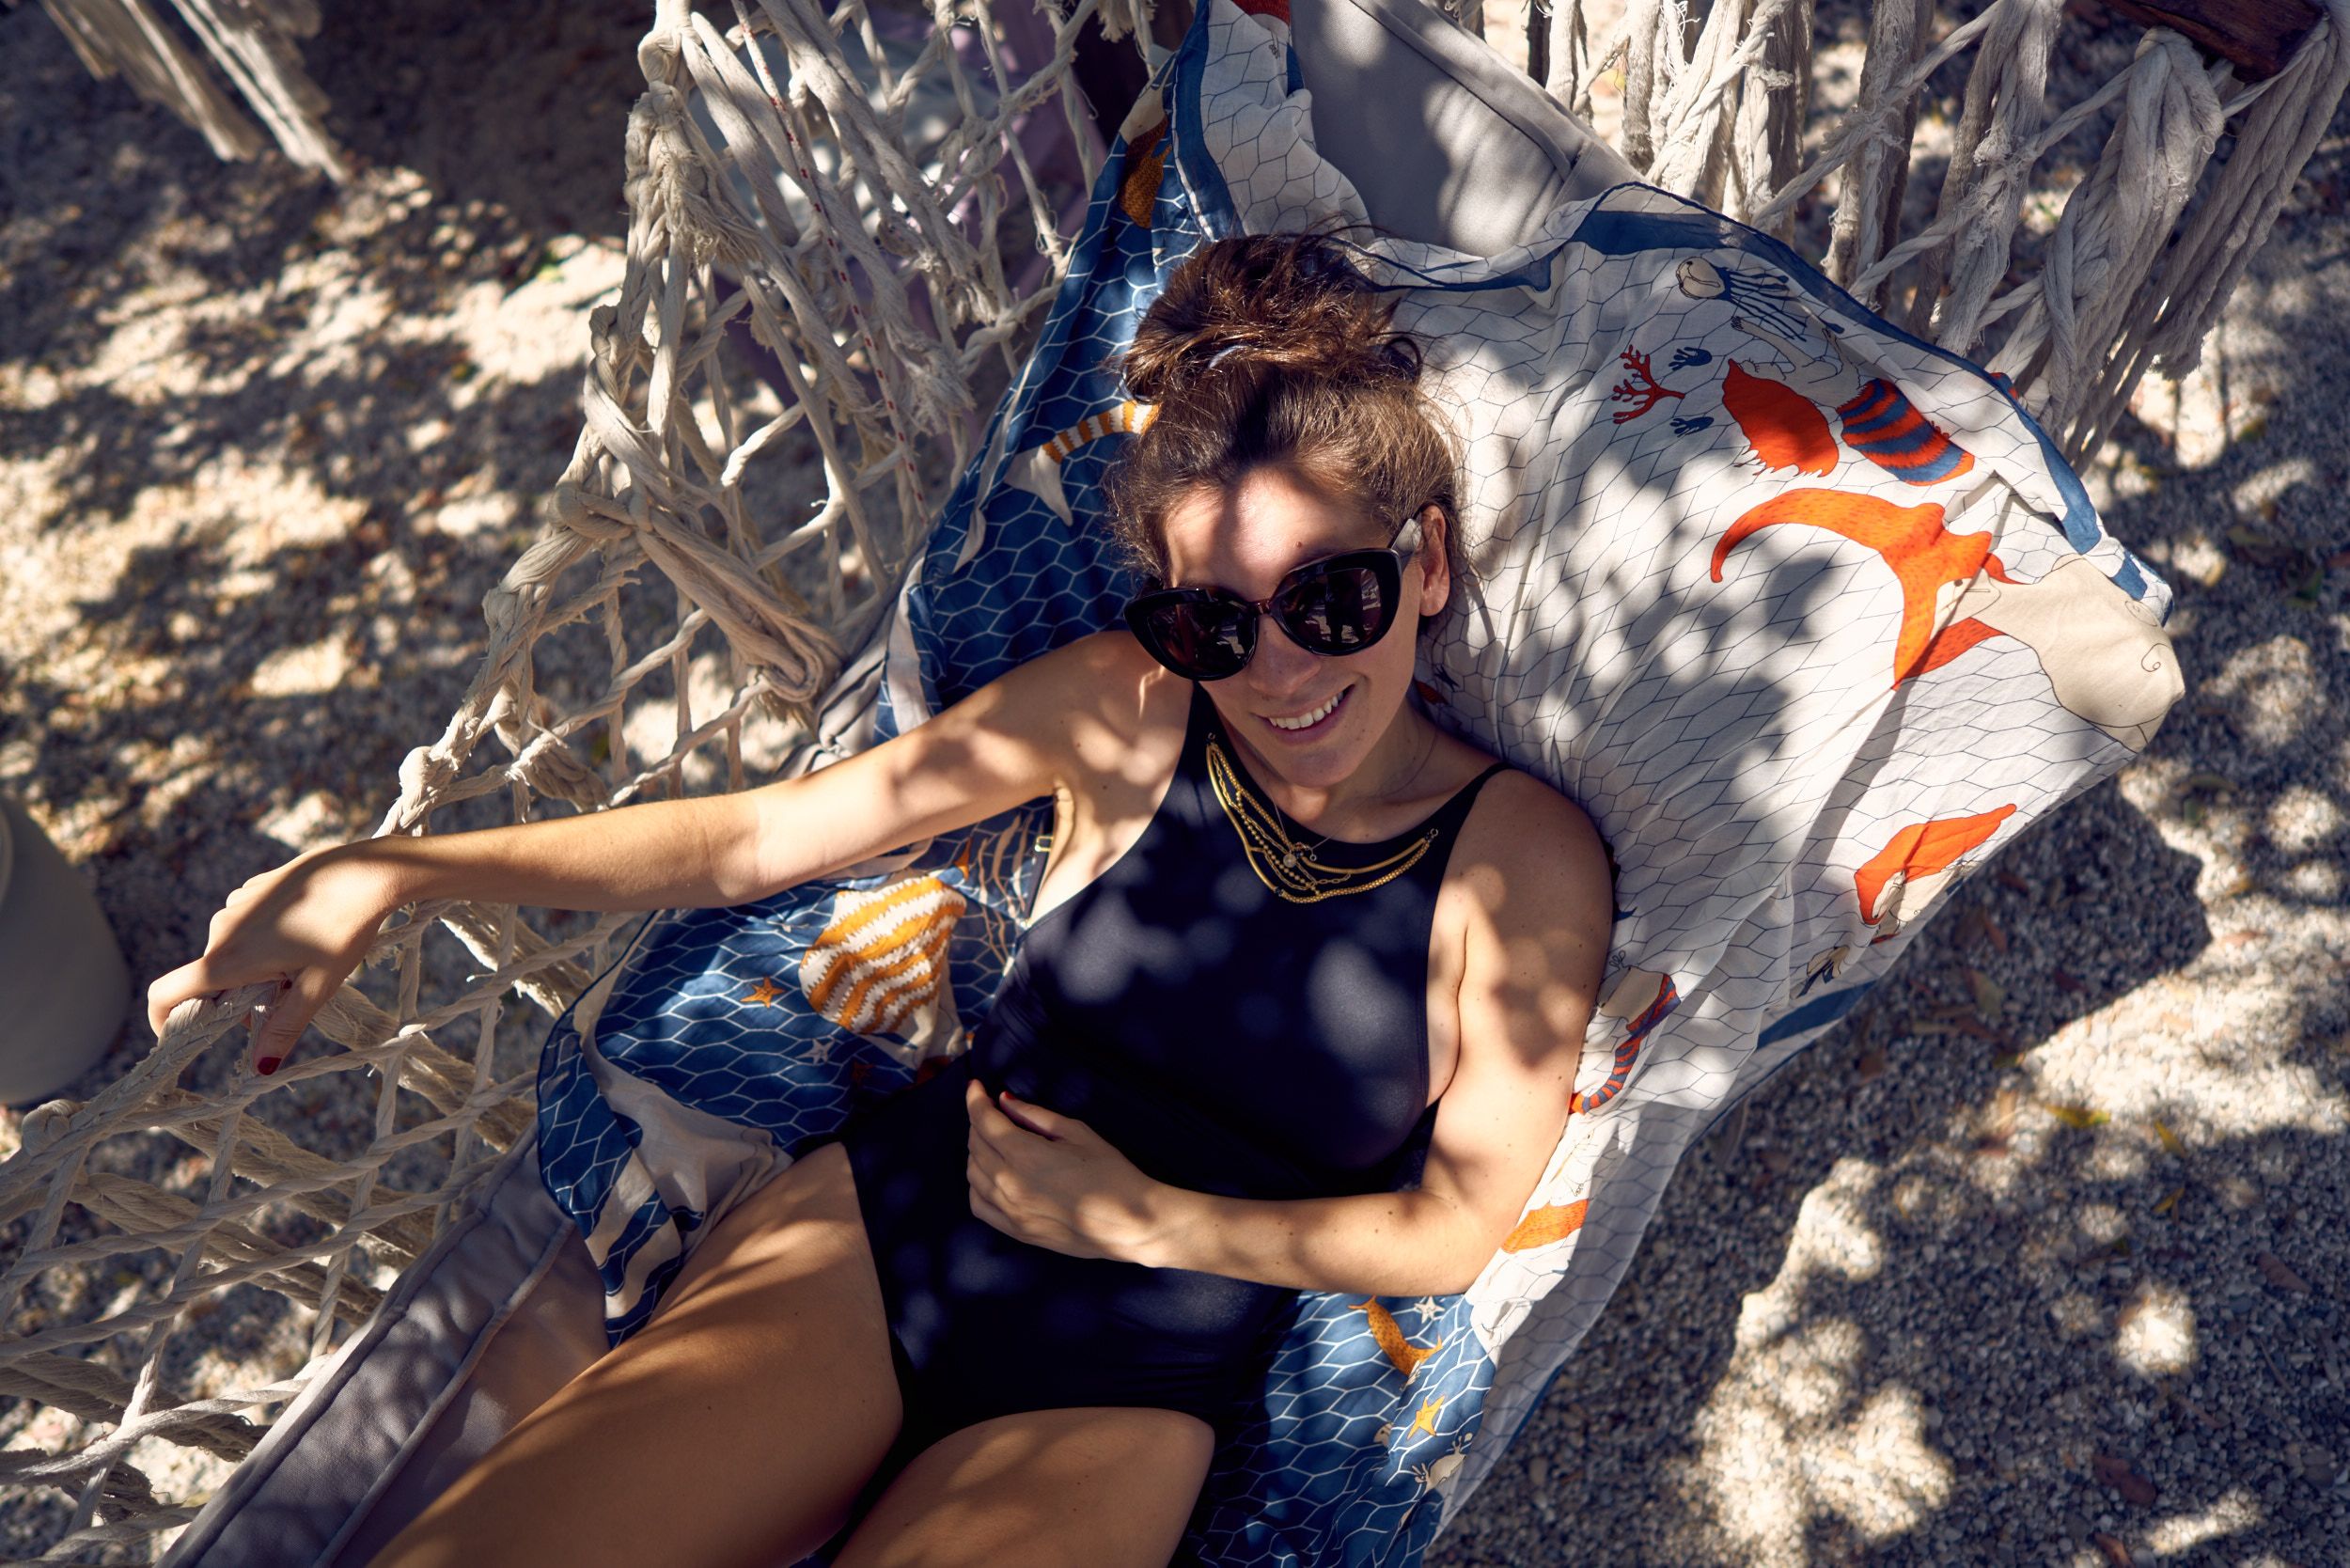 billur saatci, offnegiysem, street style, turkish style blogger, hillside beach club, sunset, heaven on earth, sand and blue, marni